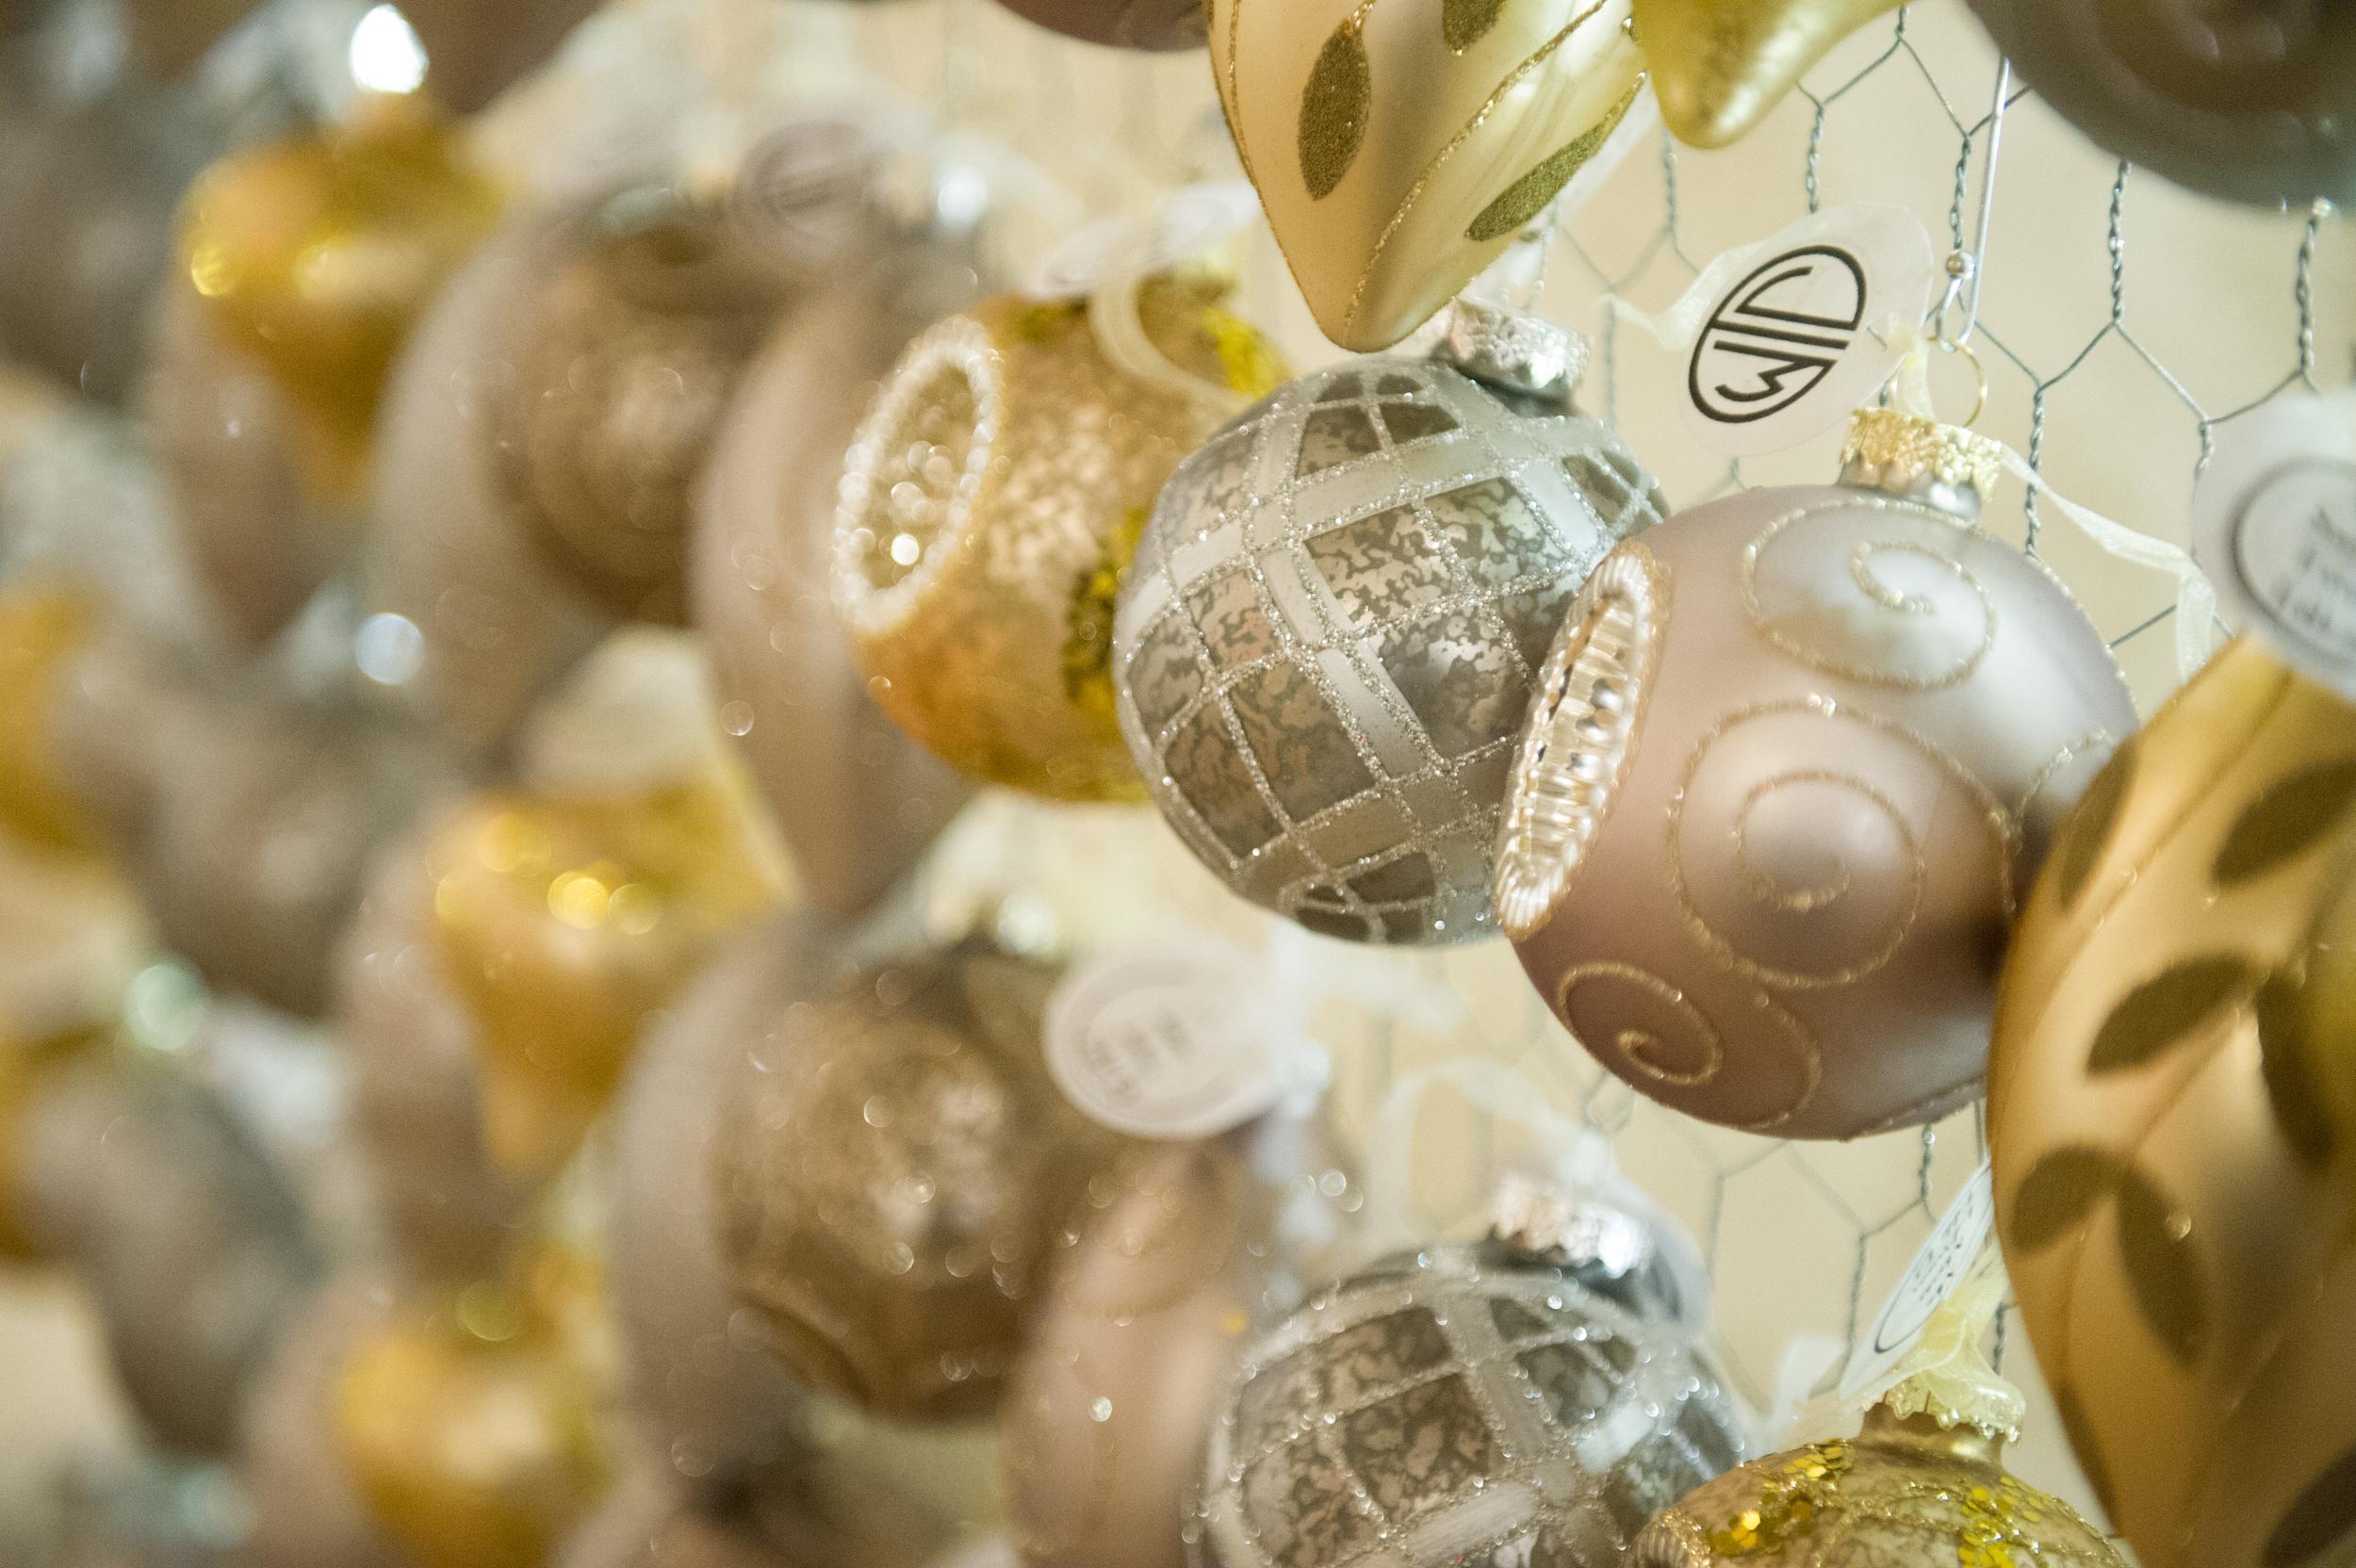 wedding favor ideas - ornaments